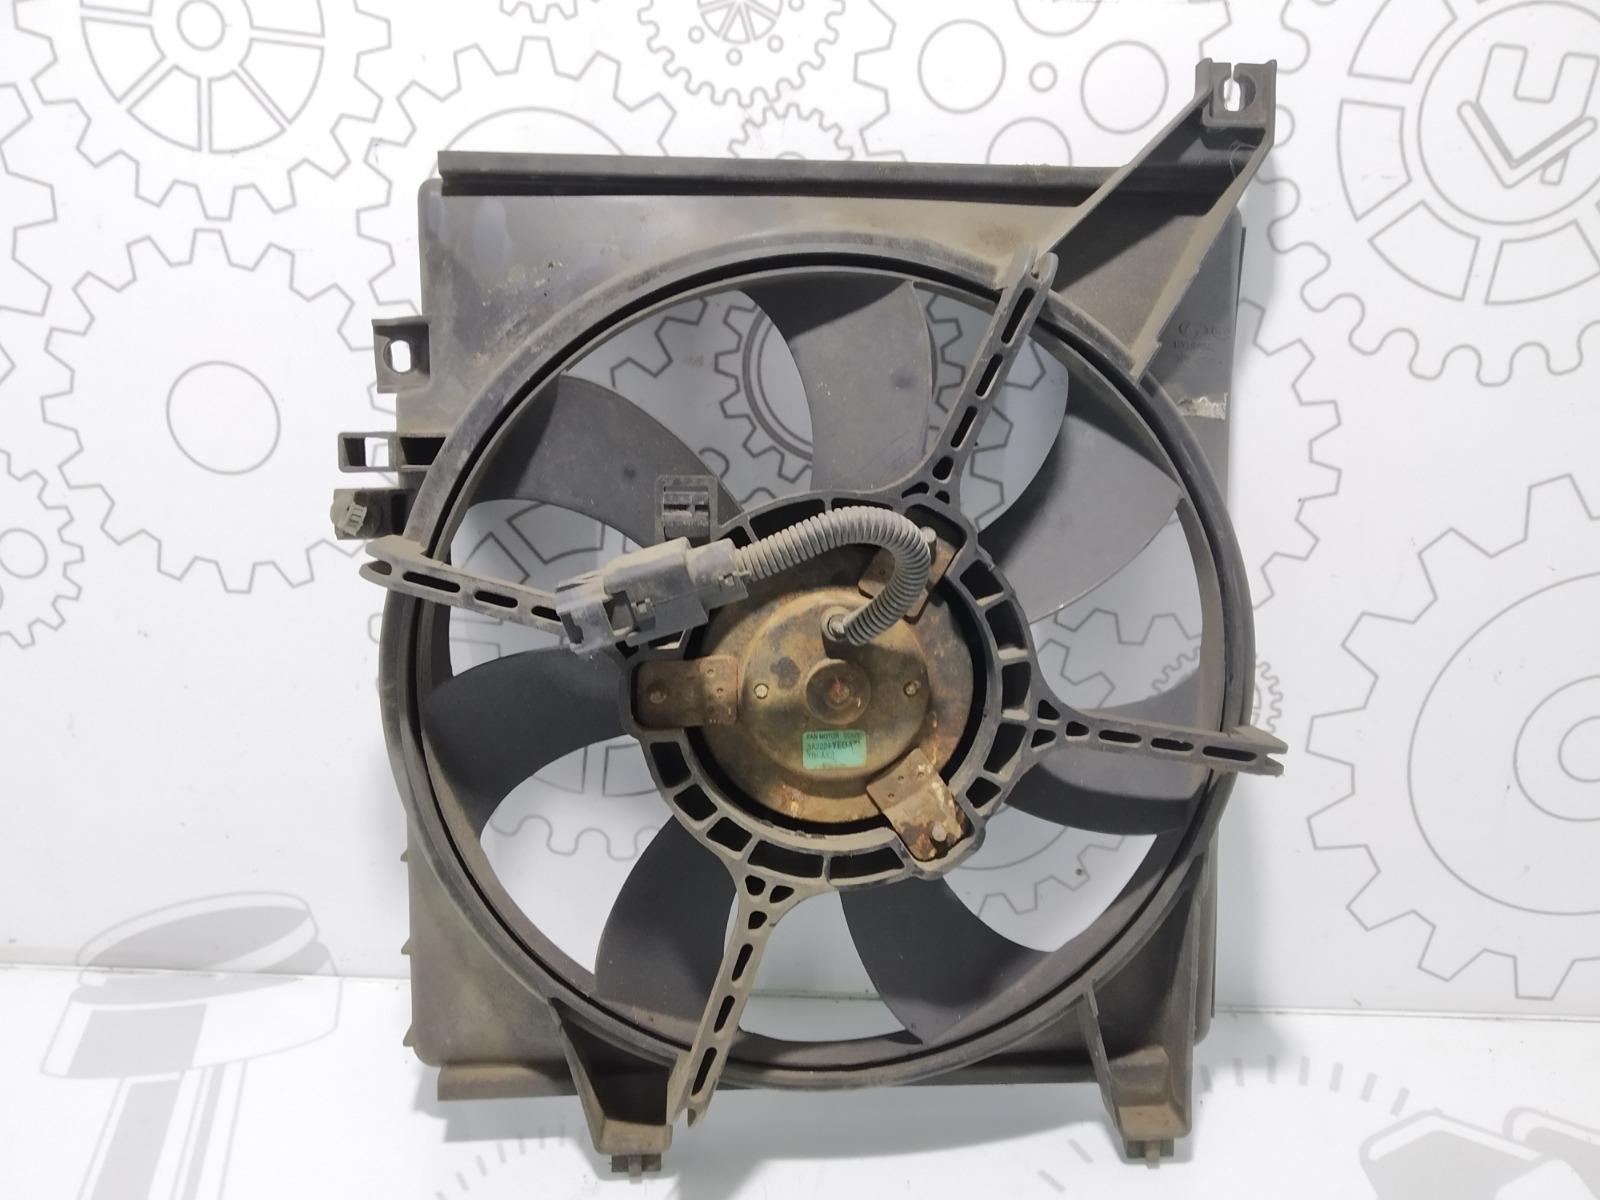 Вентилятор радиатора Hyundai Getz 1.1 I 2003 (б/у)